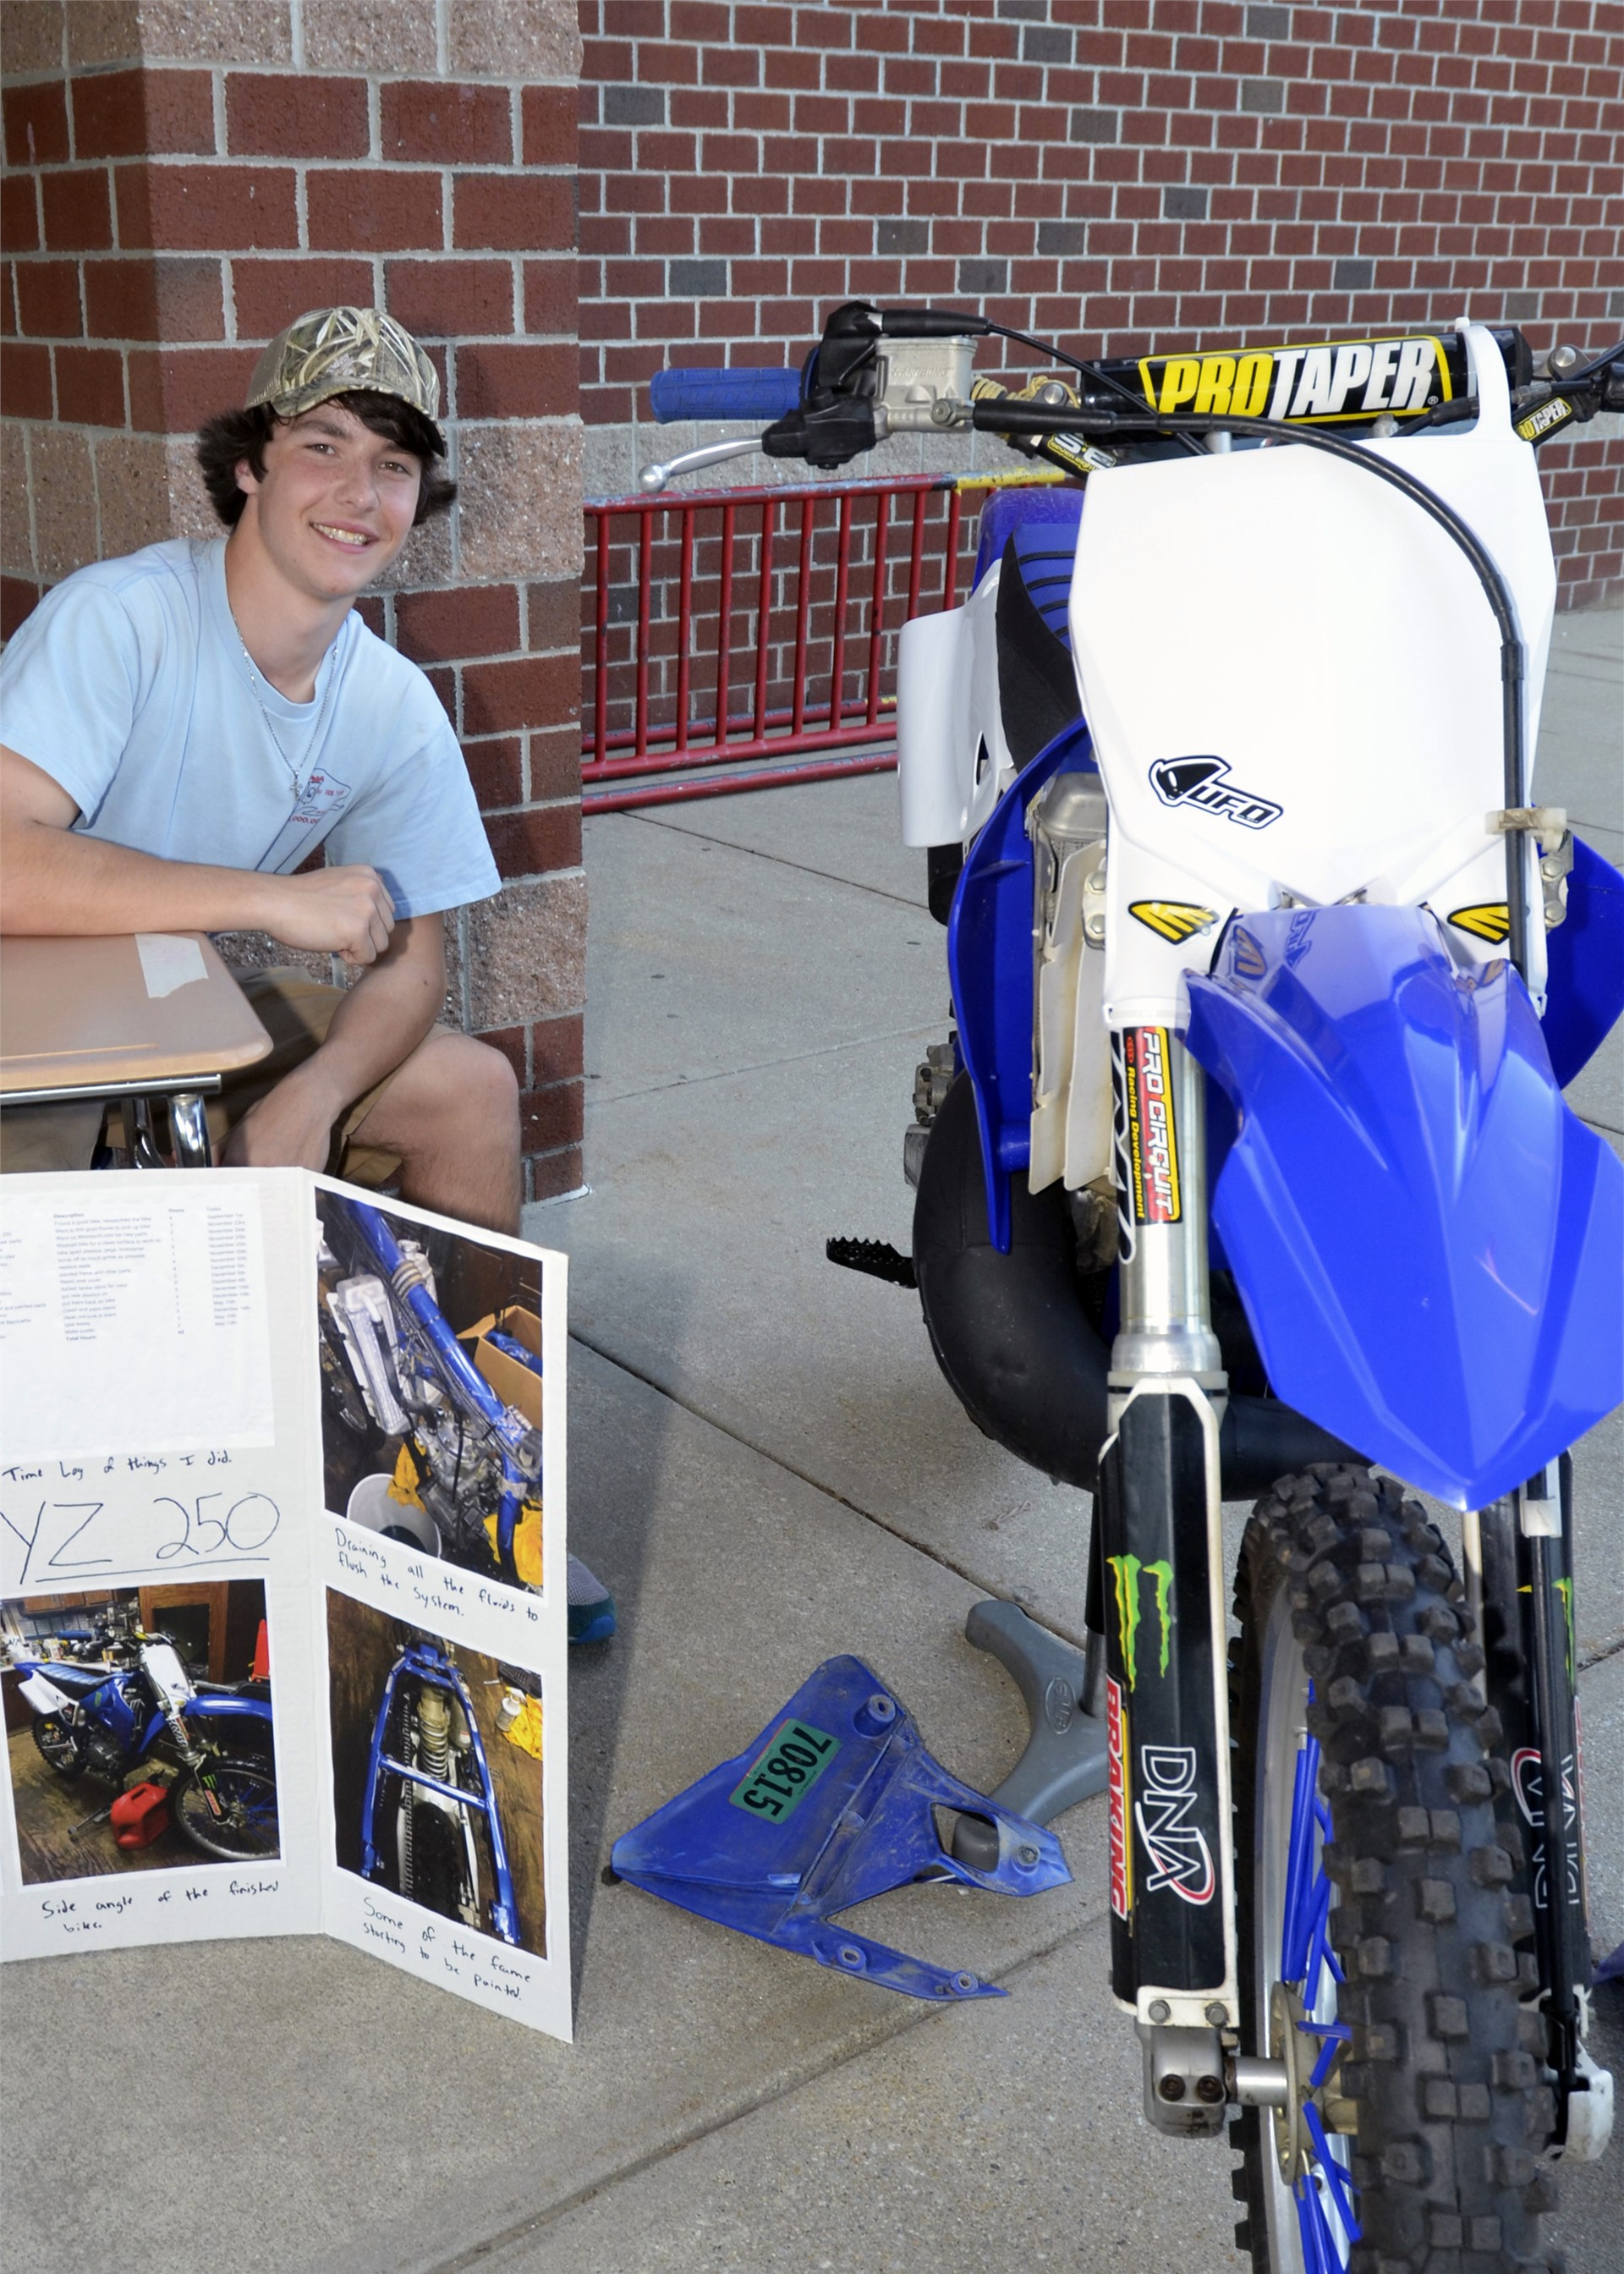 D. Mason rebuilt a dirt bike for off-road racing.